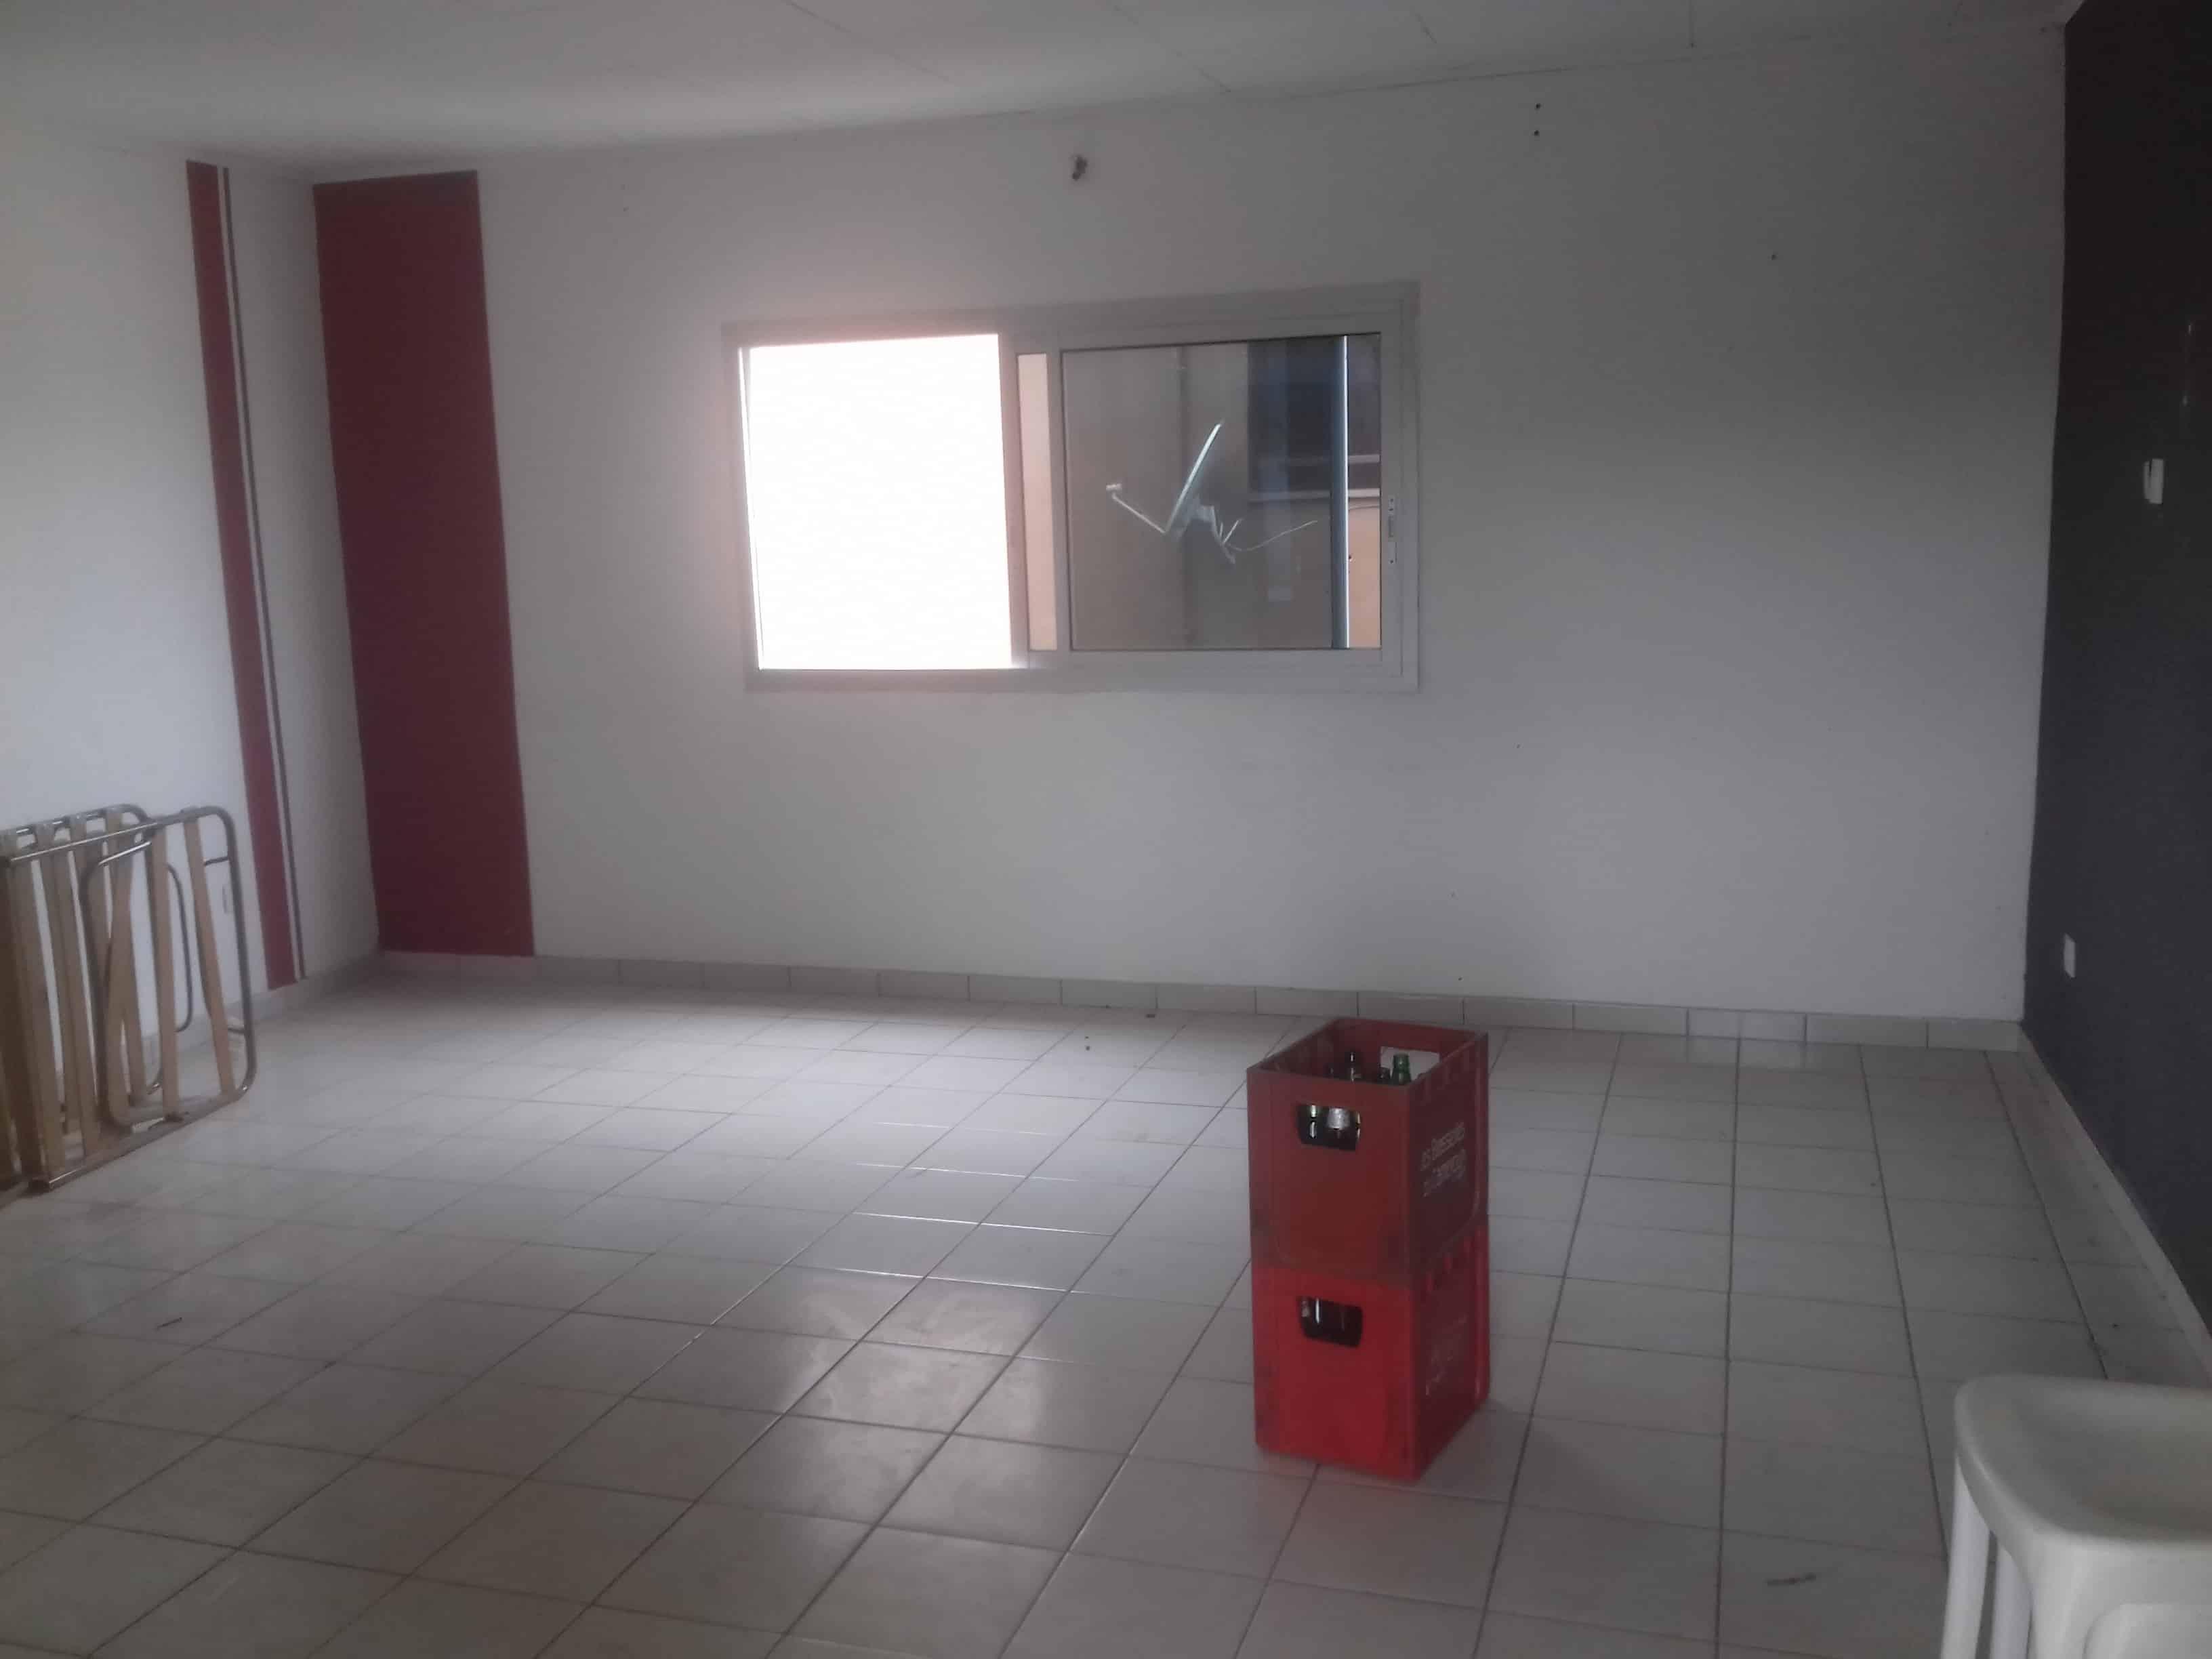 Apartment to rent - Douala, Bonamoussadi, Gendarmerie - 1 living room(s), 2 bedroom(s), 1 bathroom(s) - 130 000 FCFA / month